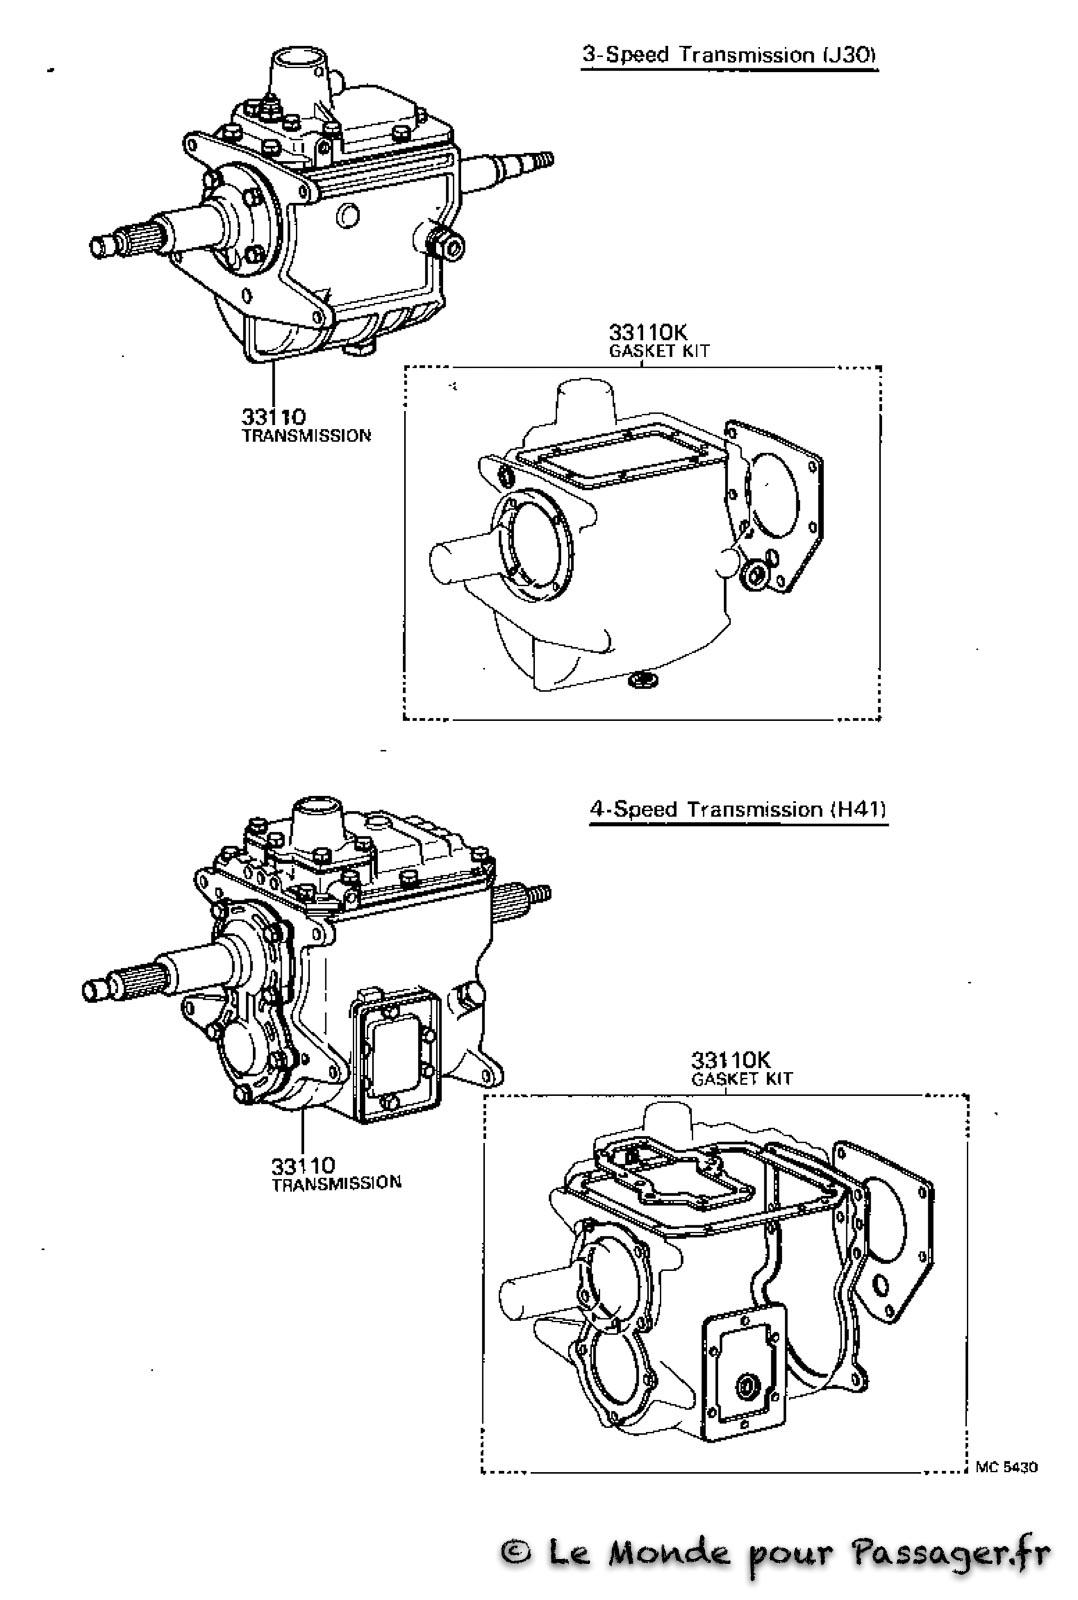 Fj55-Eclatés-Techniques149